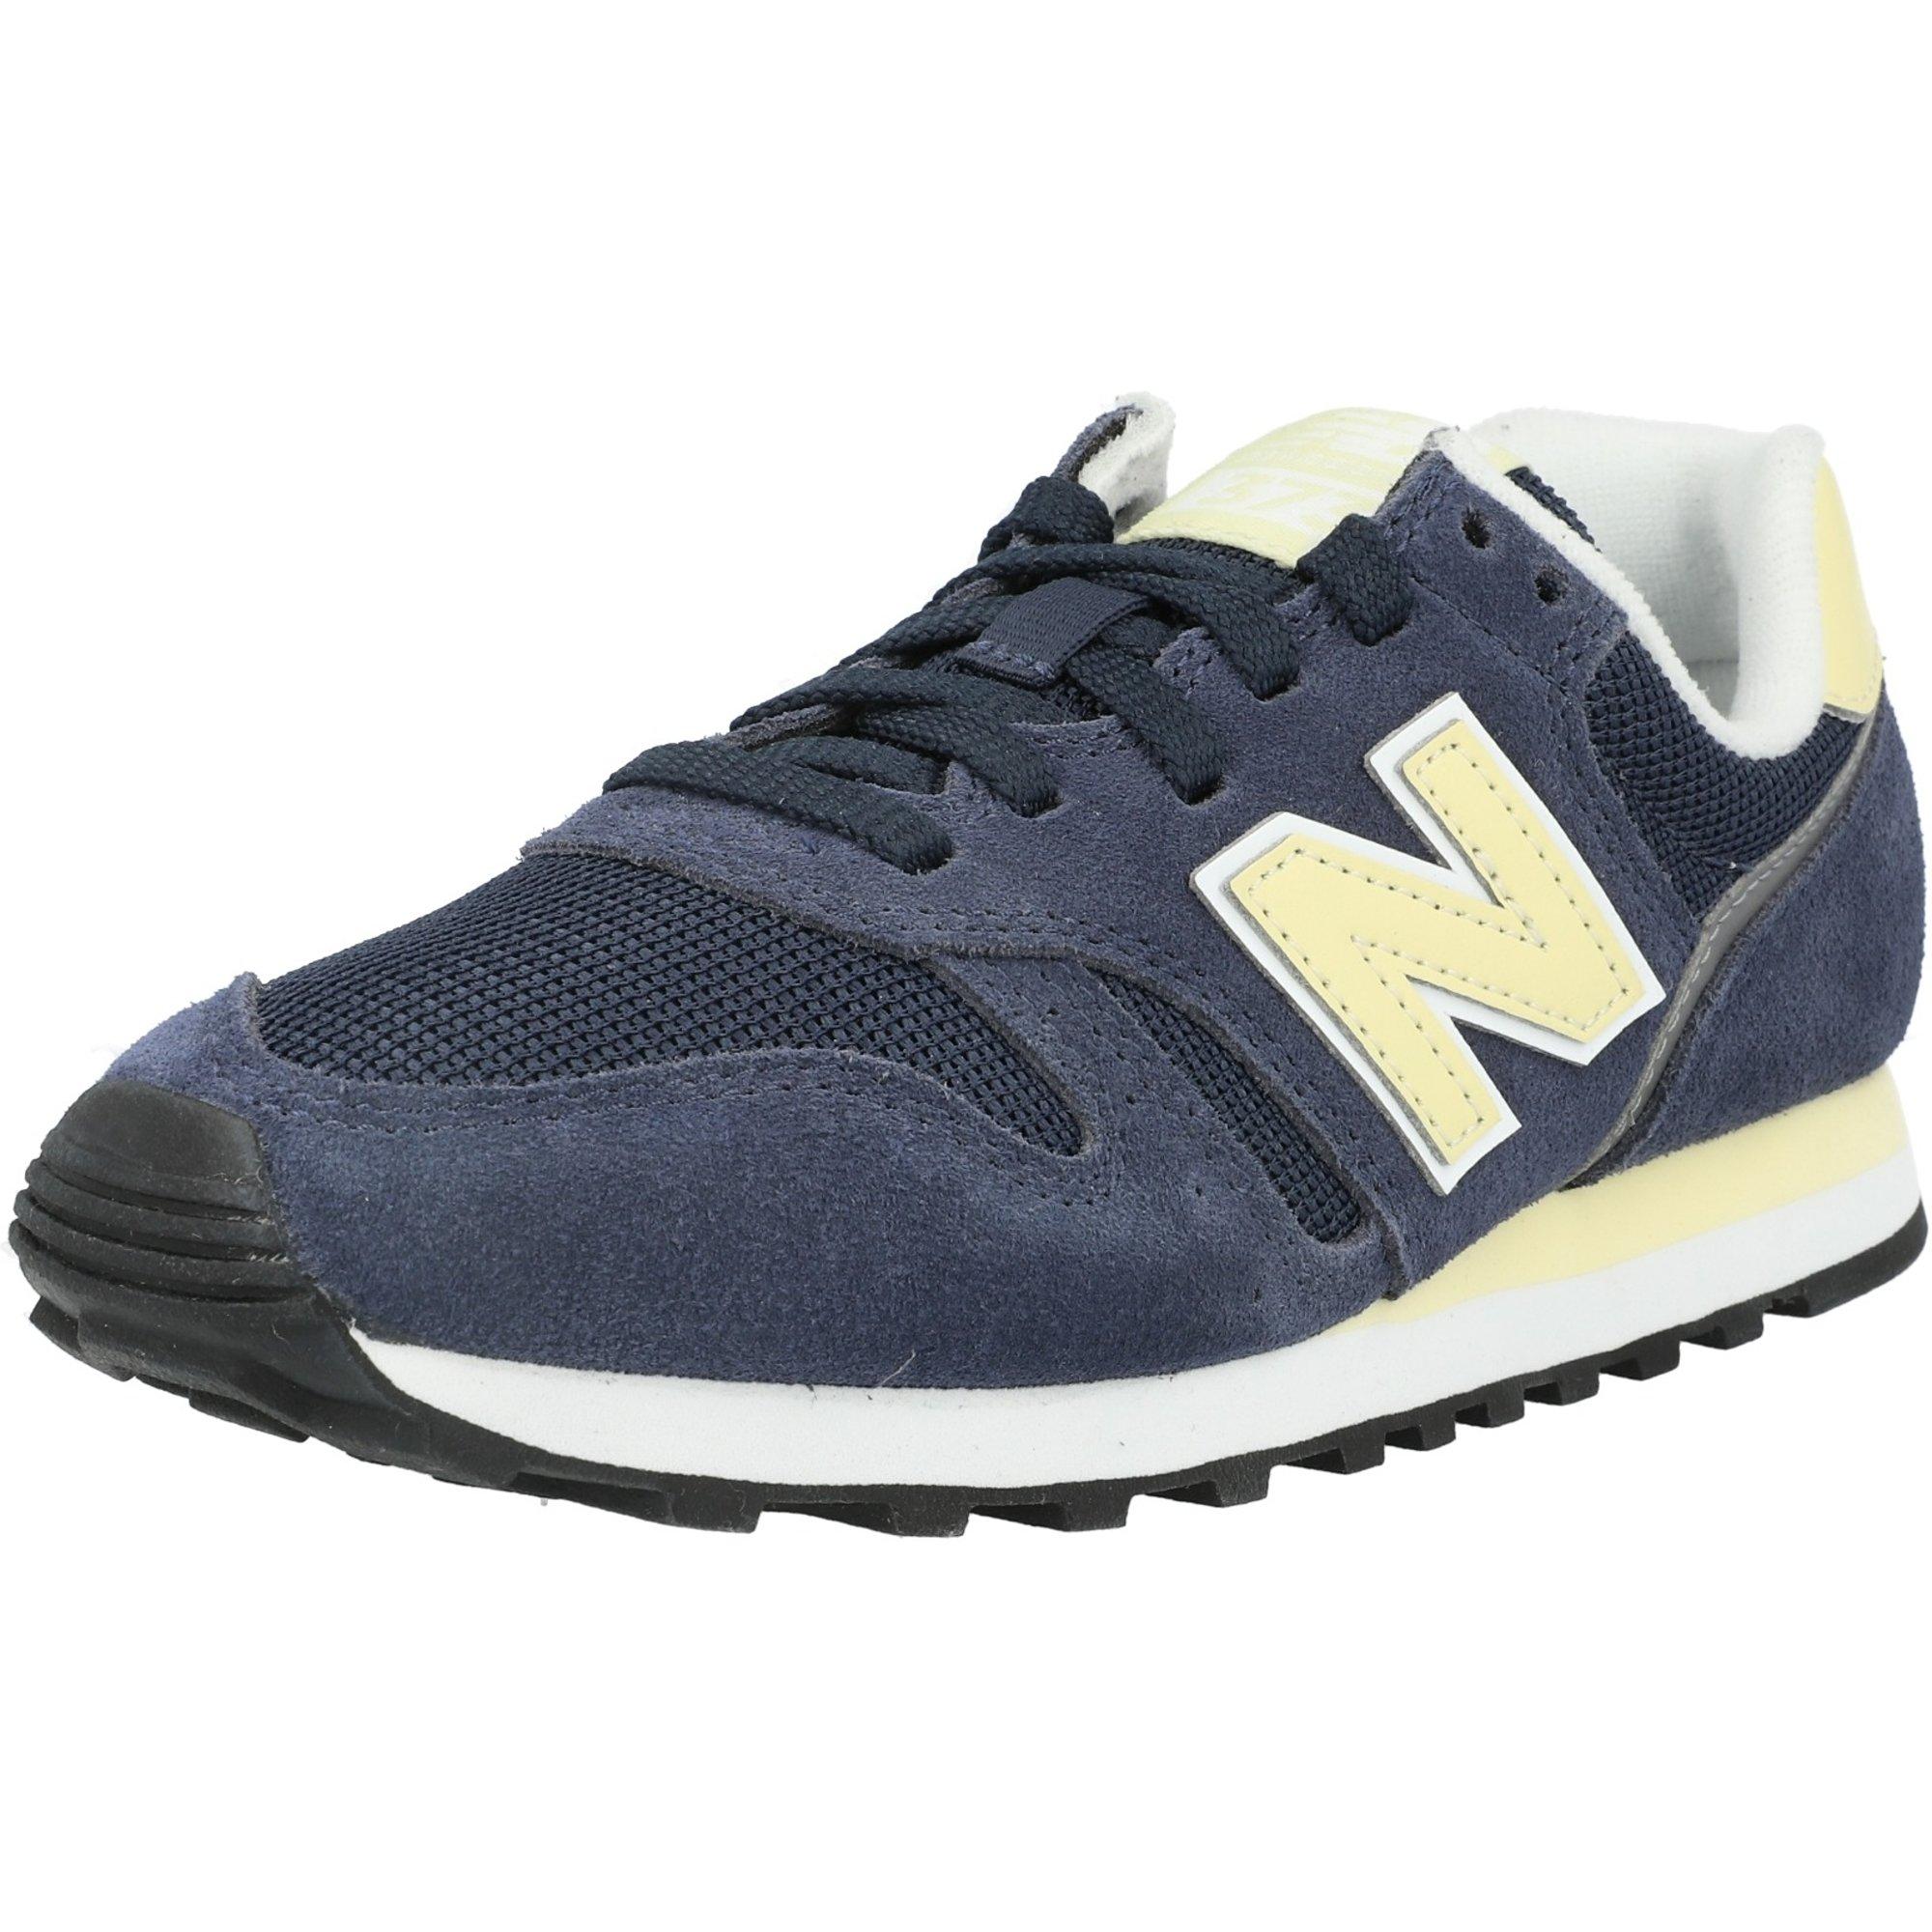 New Balance 373 Navy/Sun Glow Suede